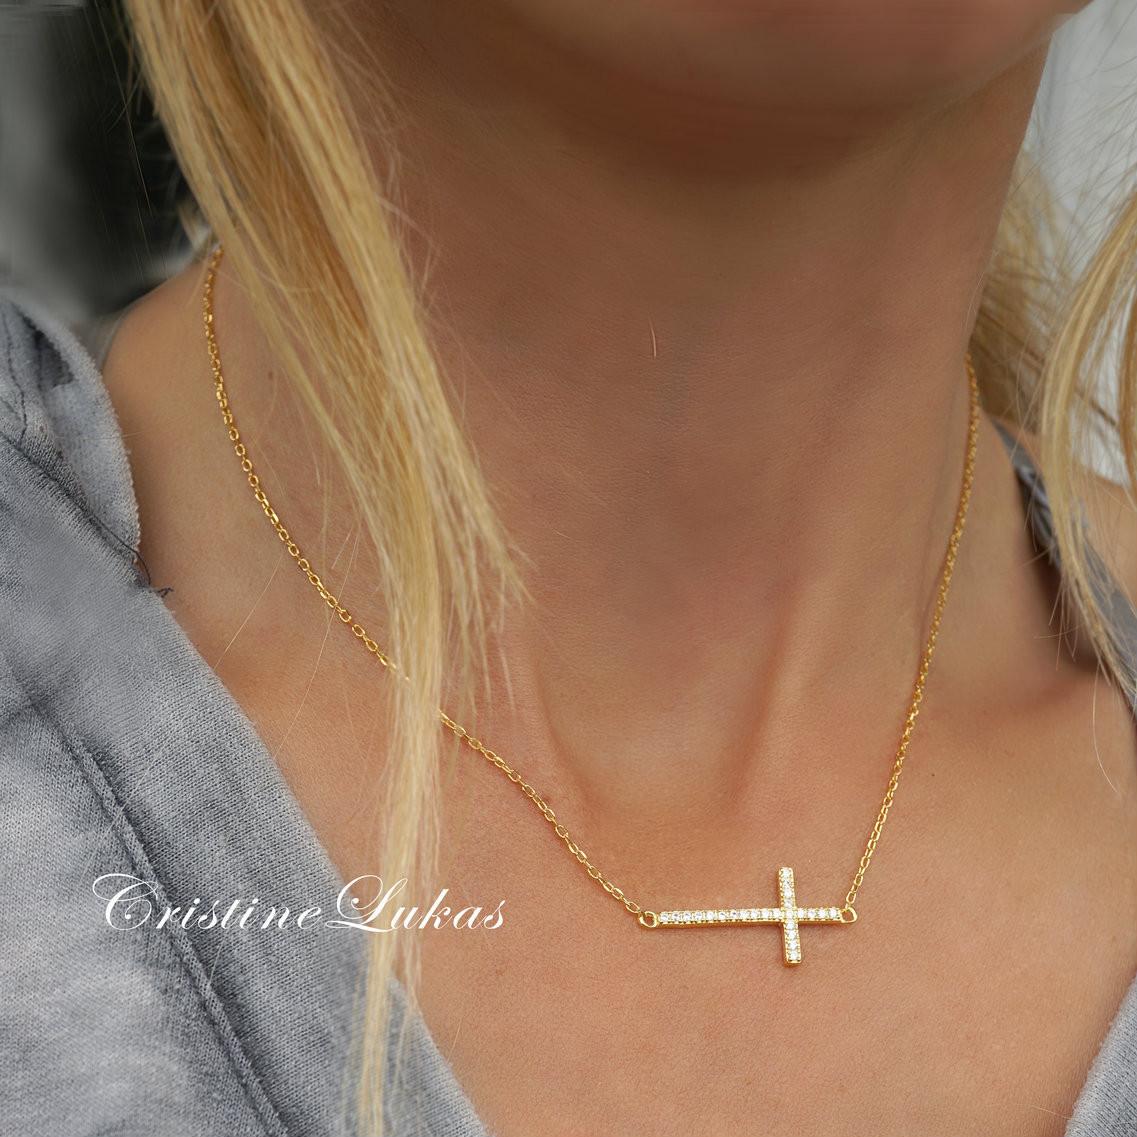 Celebrity Style Horizontal Sideway Cross Gold Silver Pendant Necklace Jewelry NJ